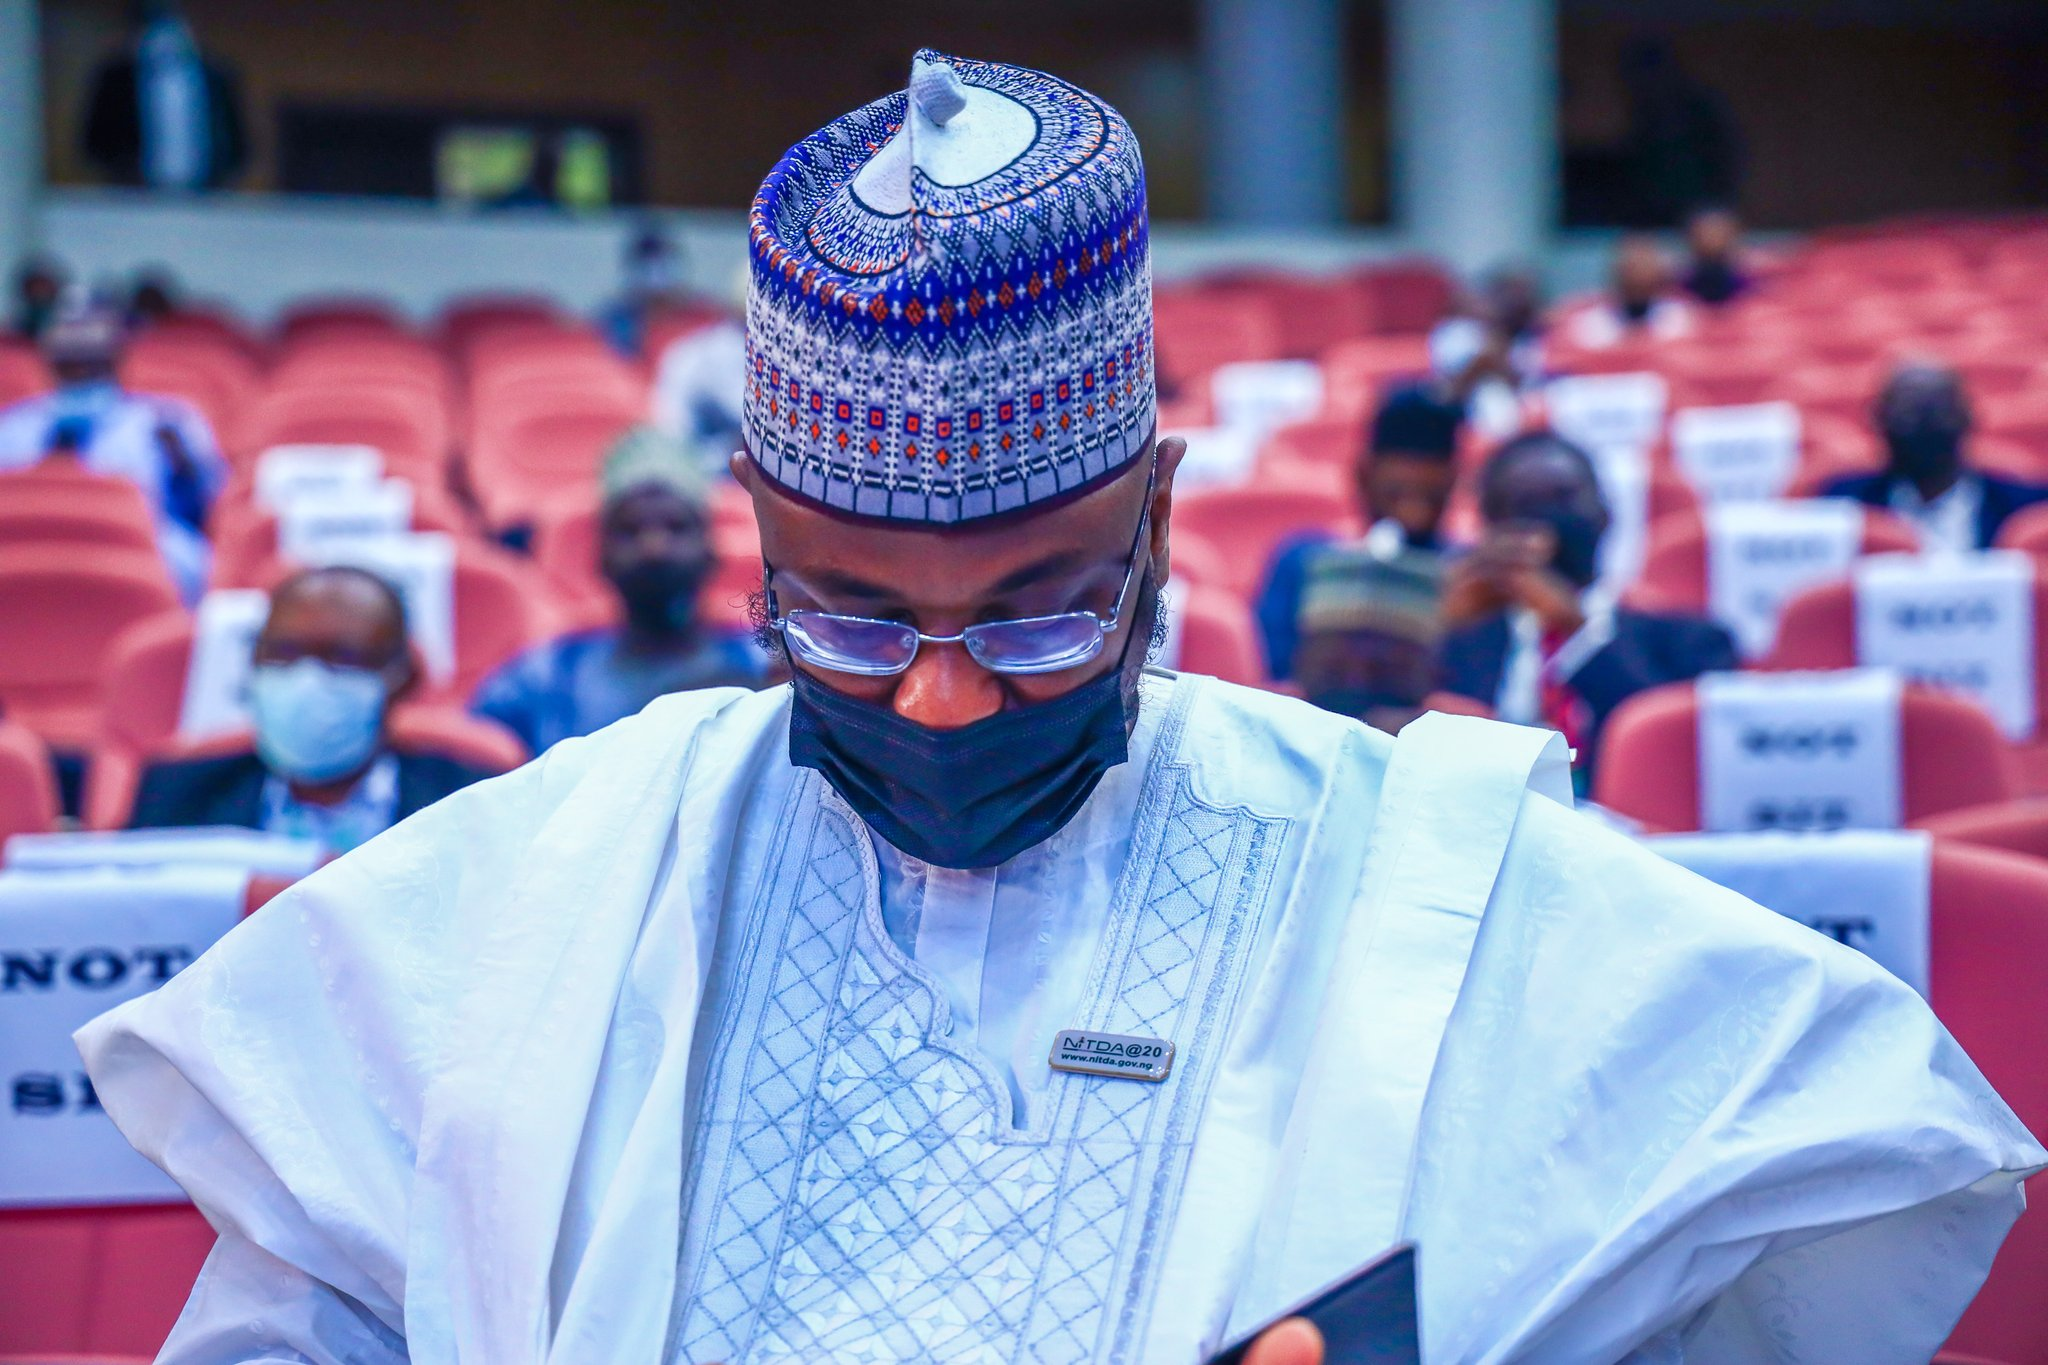 Isa Ali Pantami, Nigeria's Minister of Comms & Digital Economy